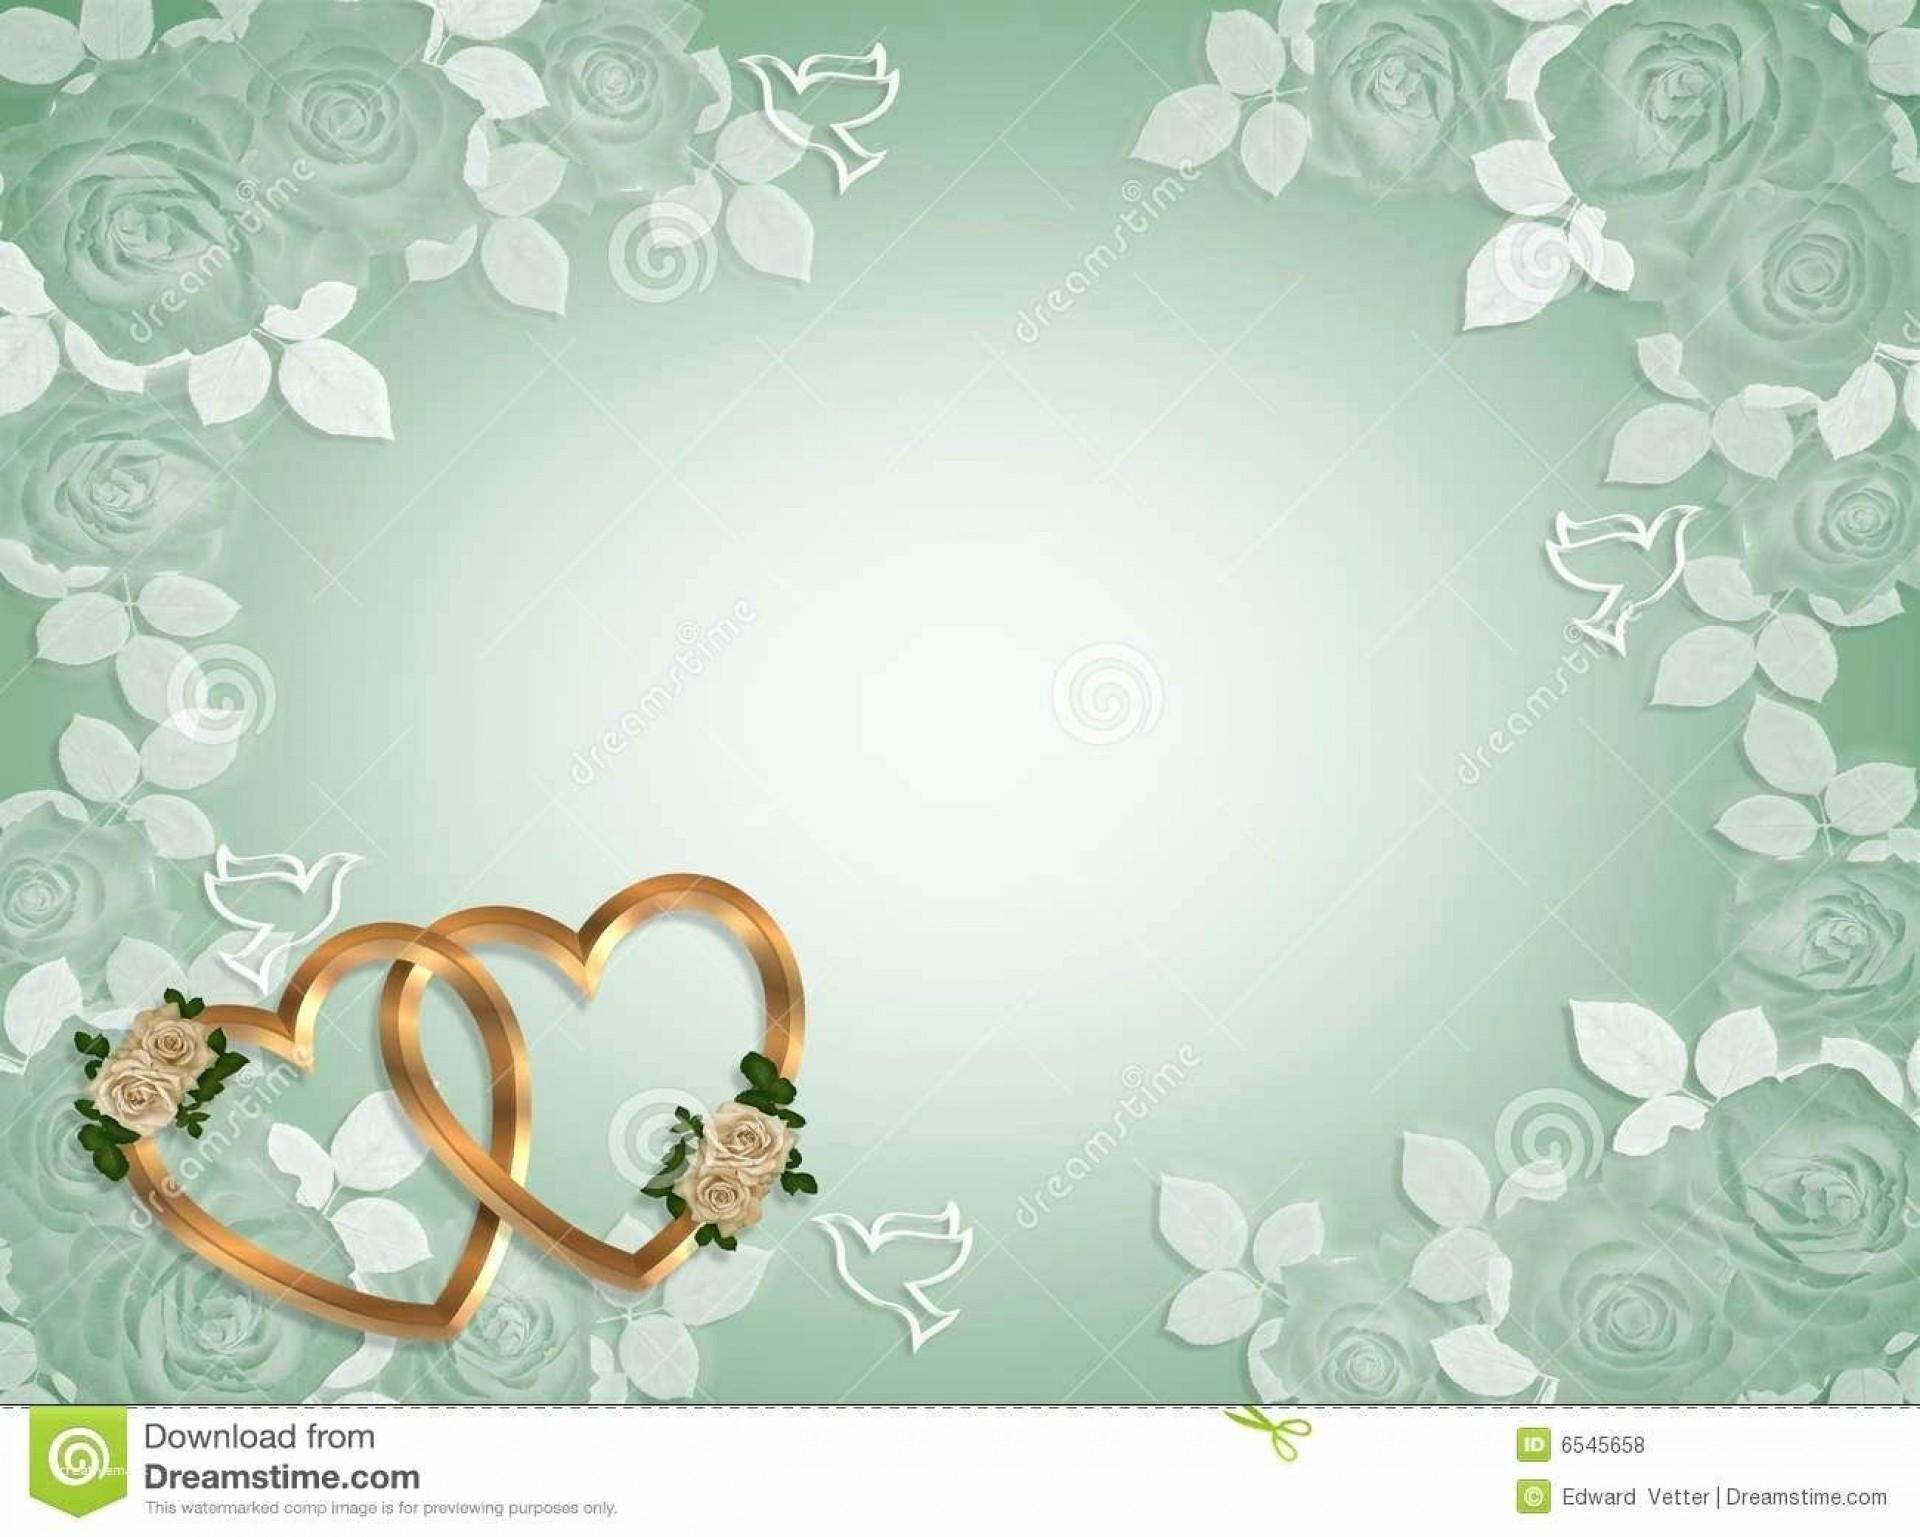 003 Sensational Sample Wedding Invitation Template Free Download Design  Wording1920